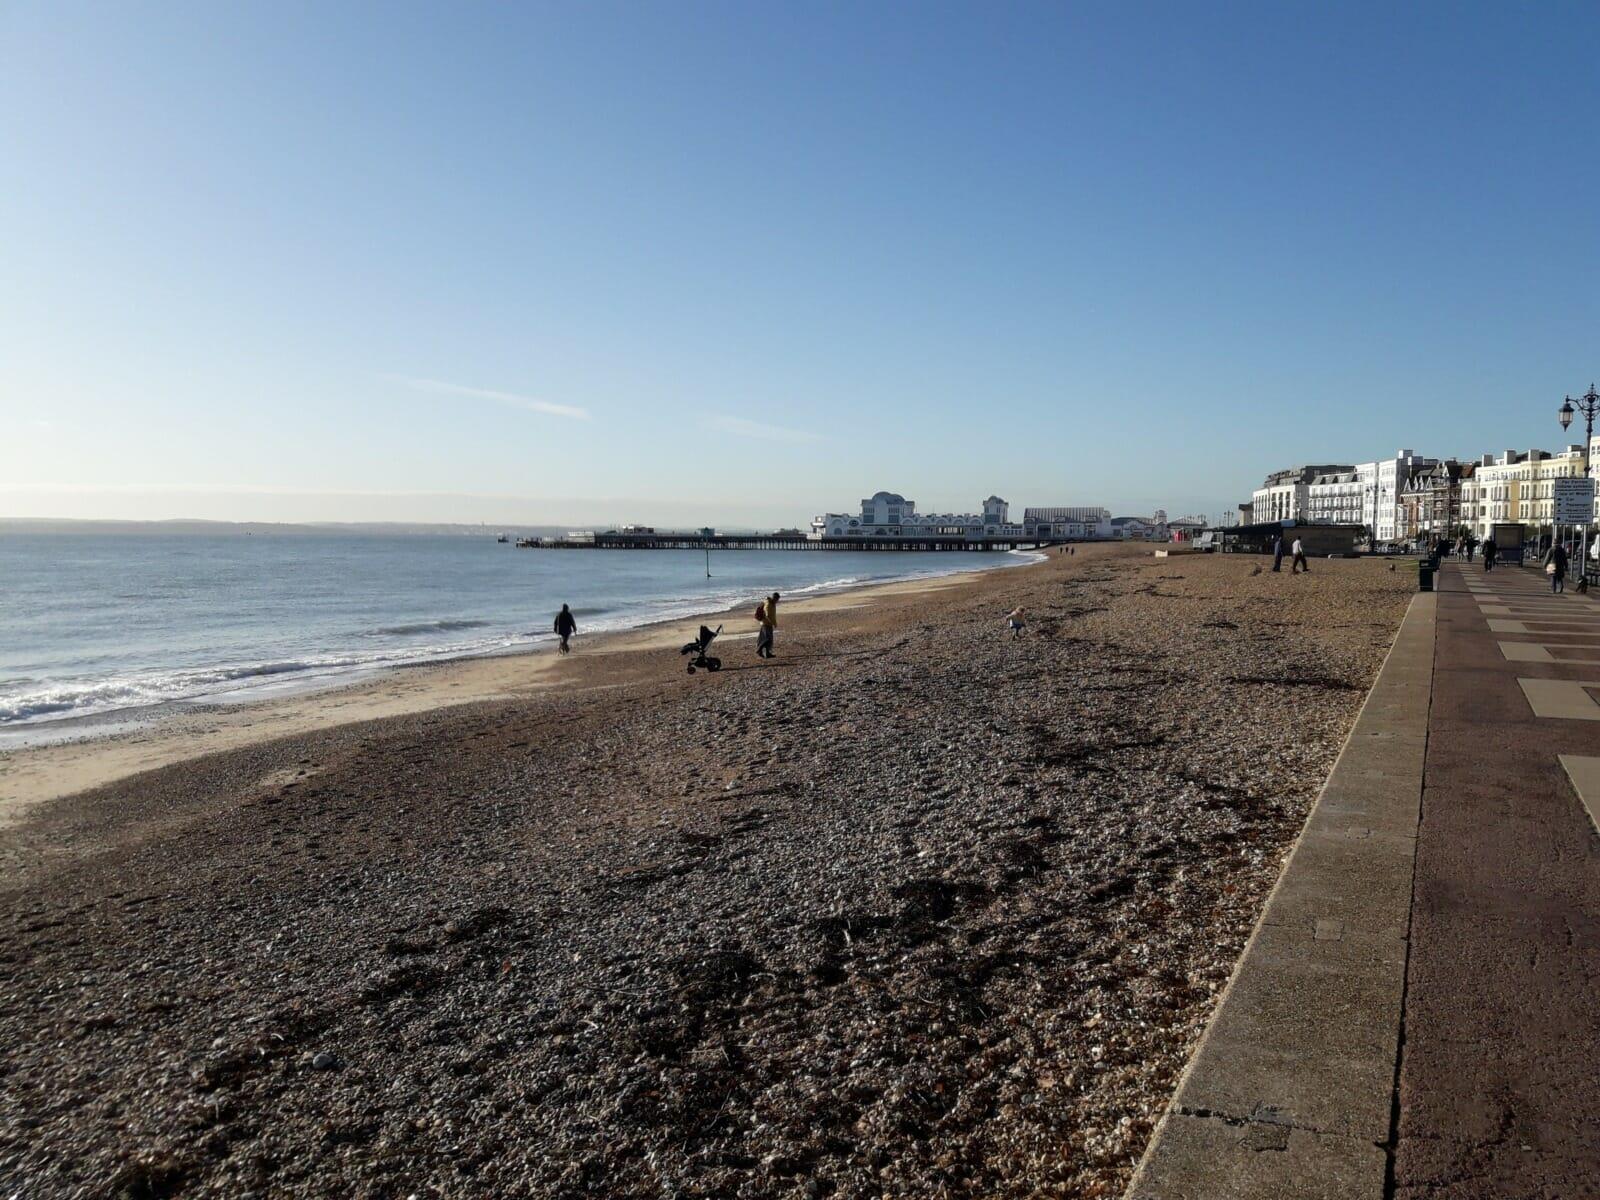 Pier and beach